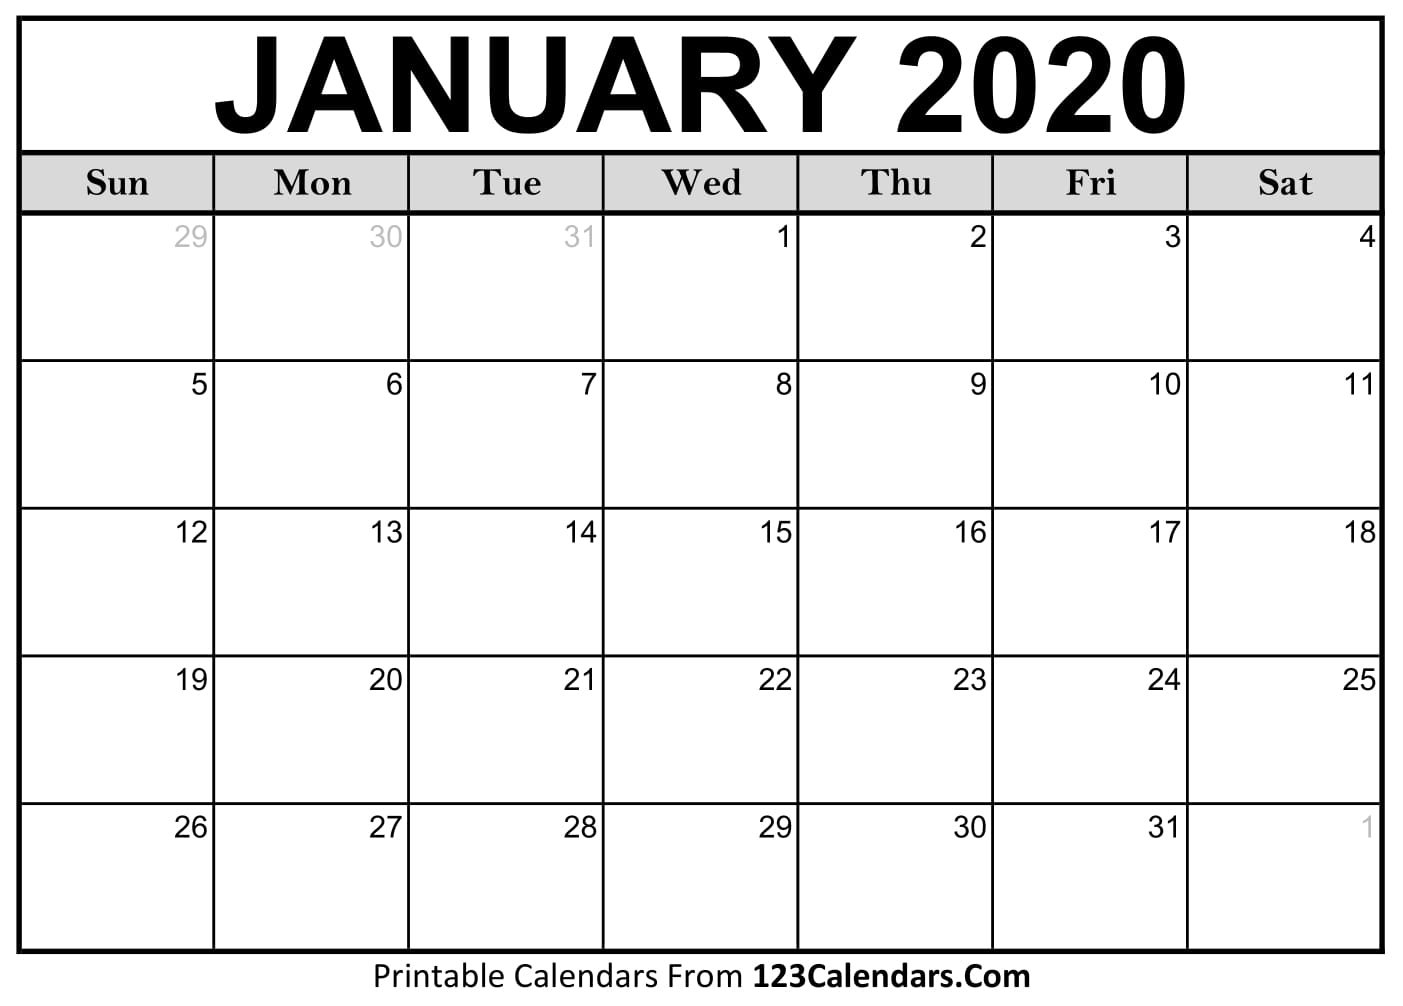 Printable Fill In Calendar For 2020 – Calendar Inspiration Free Caolendar To Fill In Online